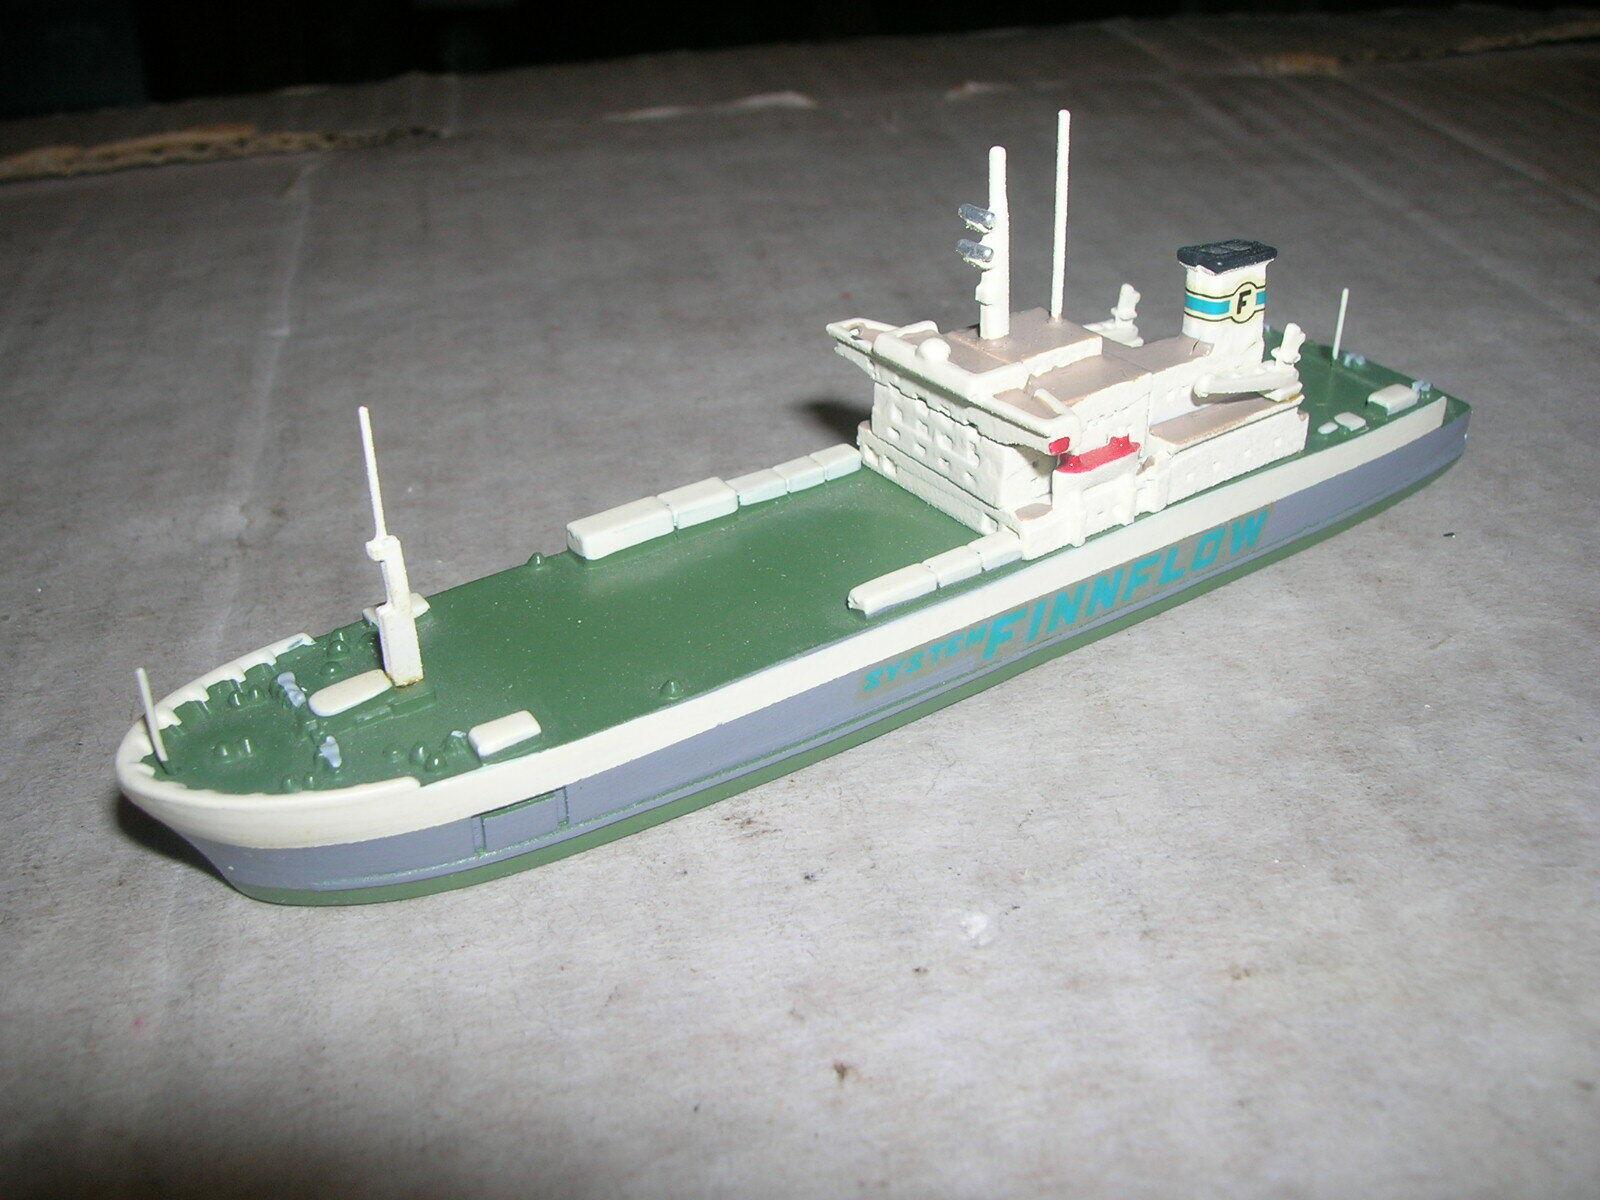 Barco modelo s 243 ferry entra  finnflow  1 1250